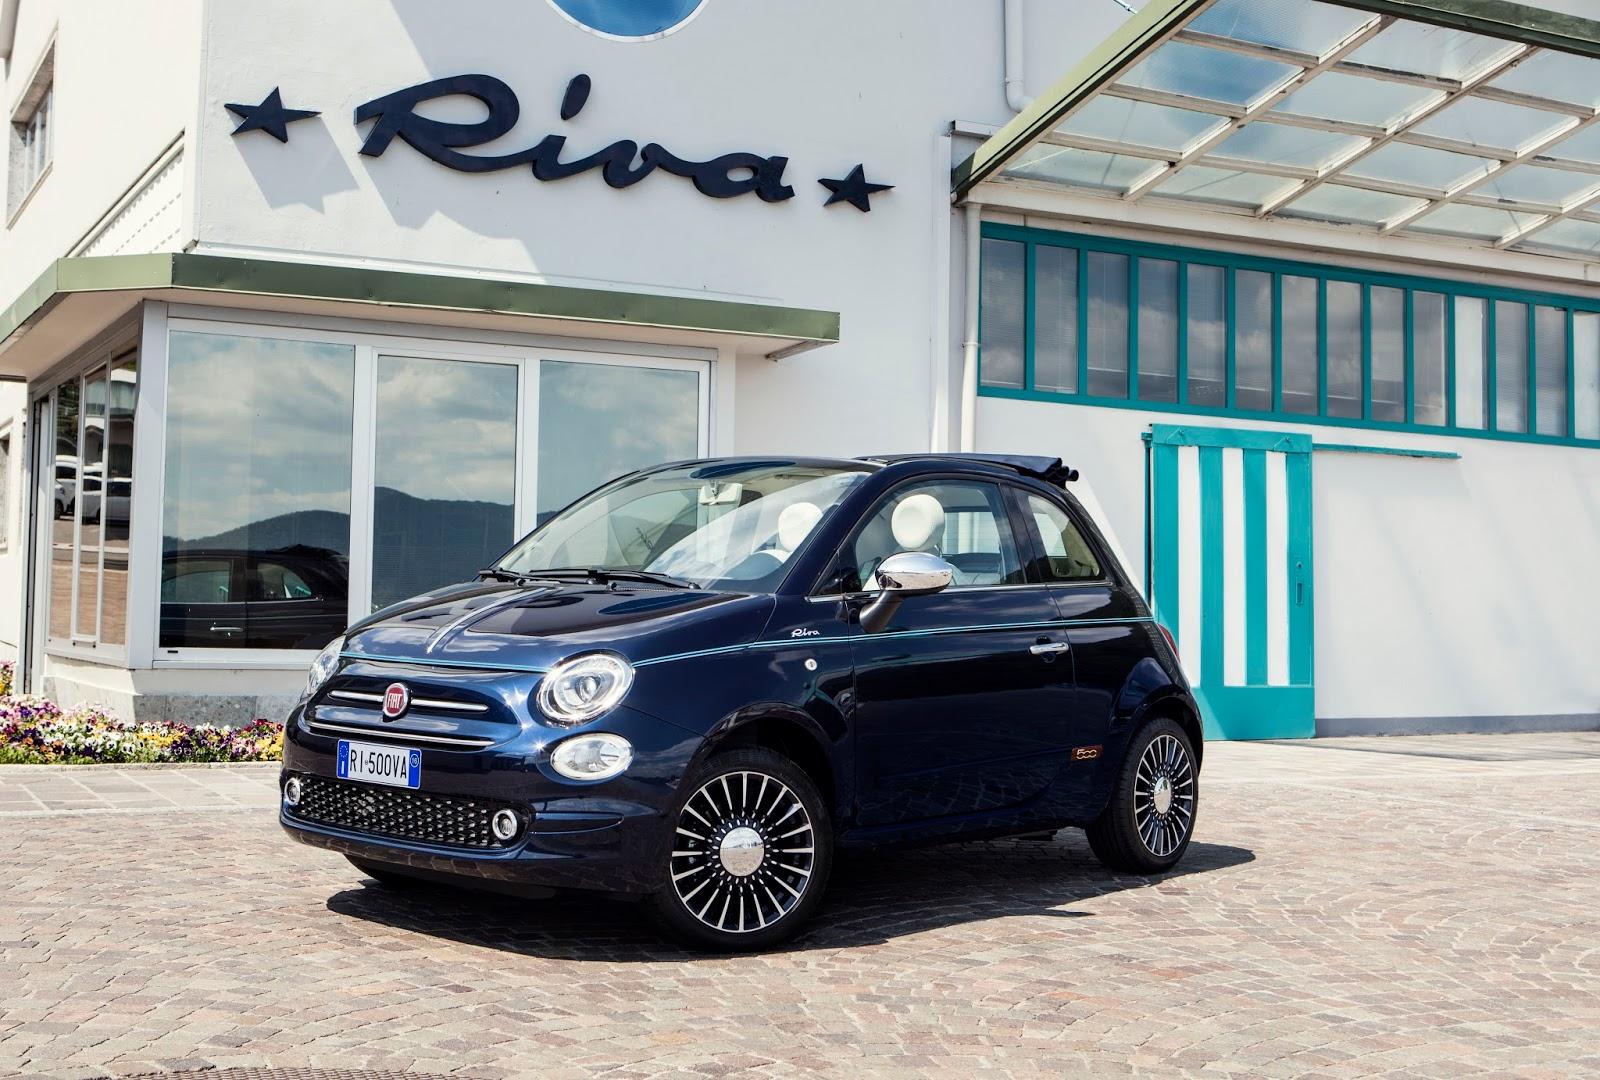 160627 Fiat 500 Riva 07 Fiat 500 Riva : Το κομψό έγινε και πολυτελές Fiat, Fiat 500, Fiat 500 Riva, Fiat 500C, Riva, supermini, videos